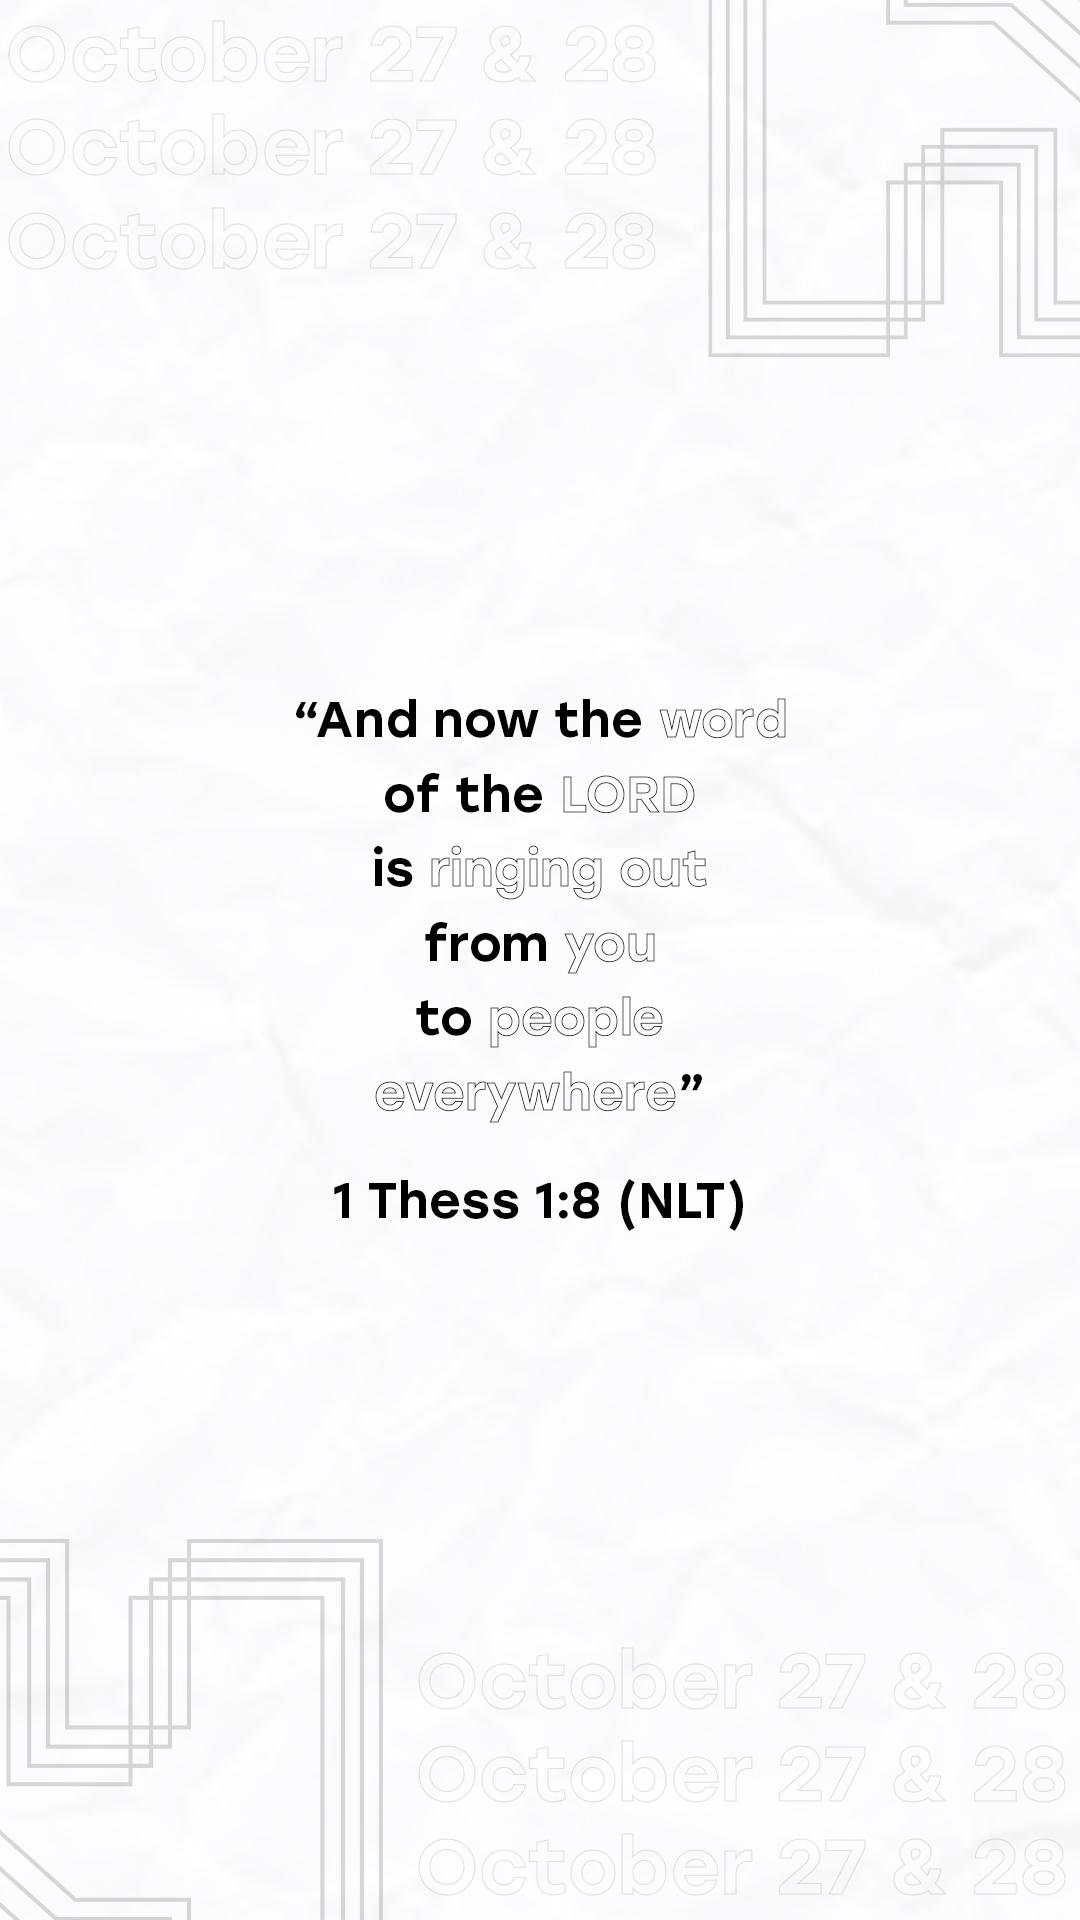 1 thess 1:8 (NLT)